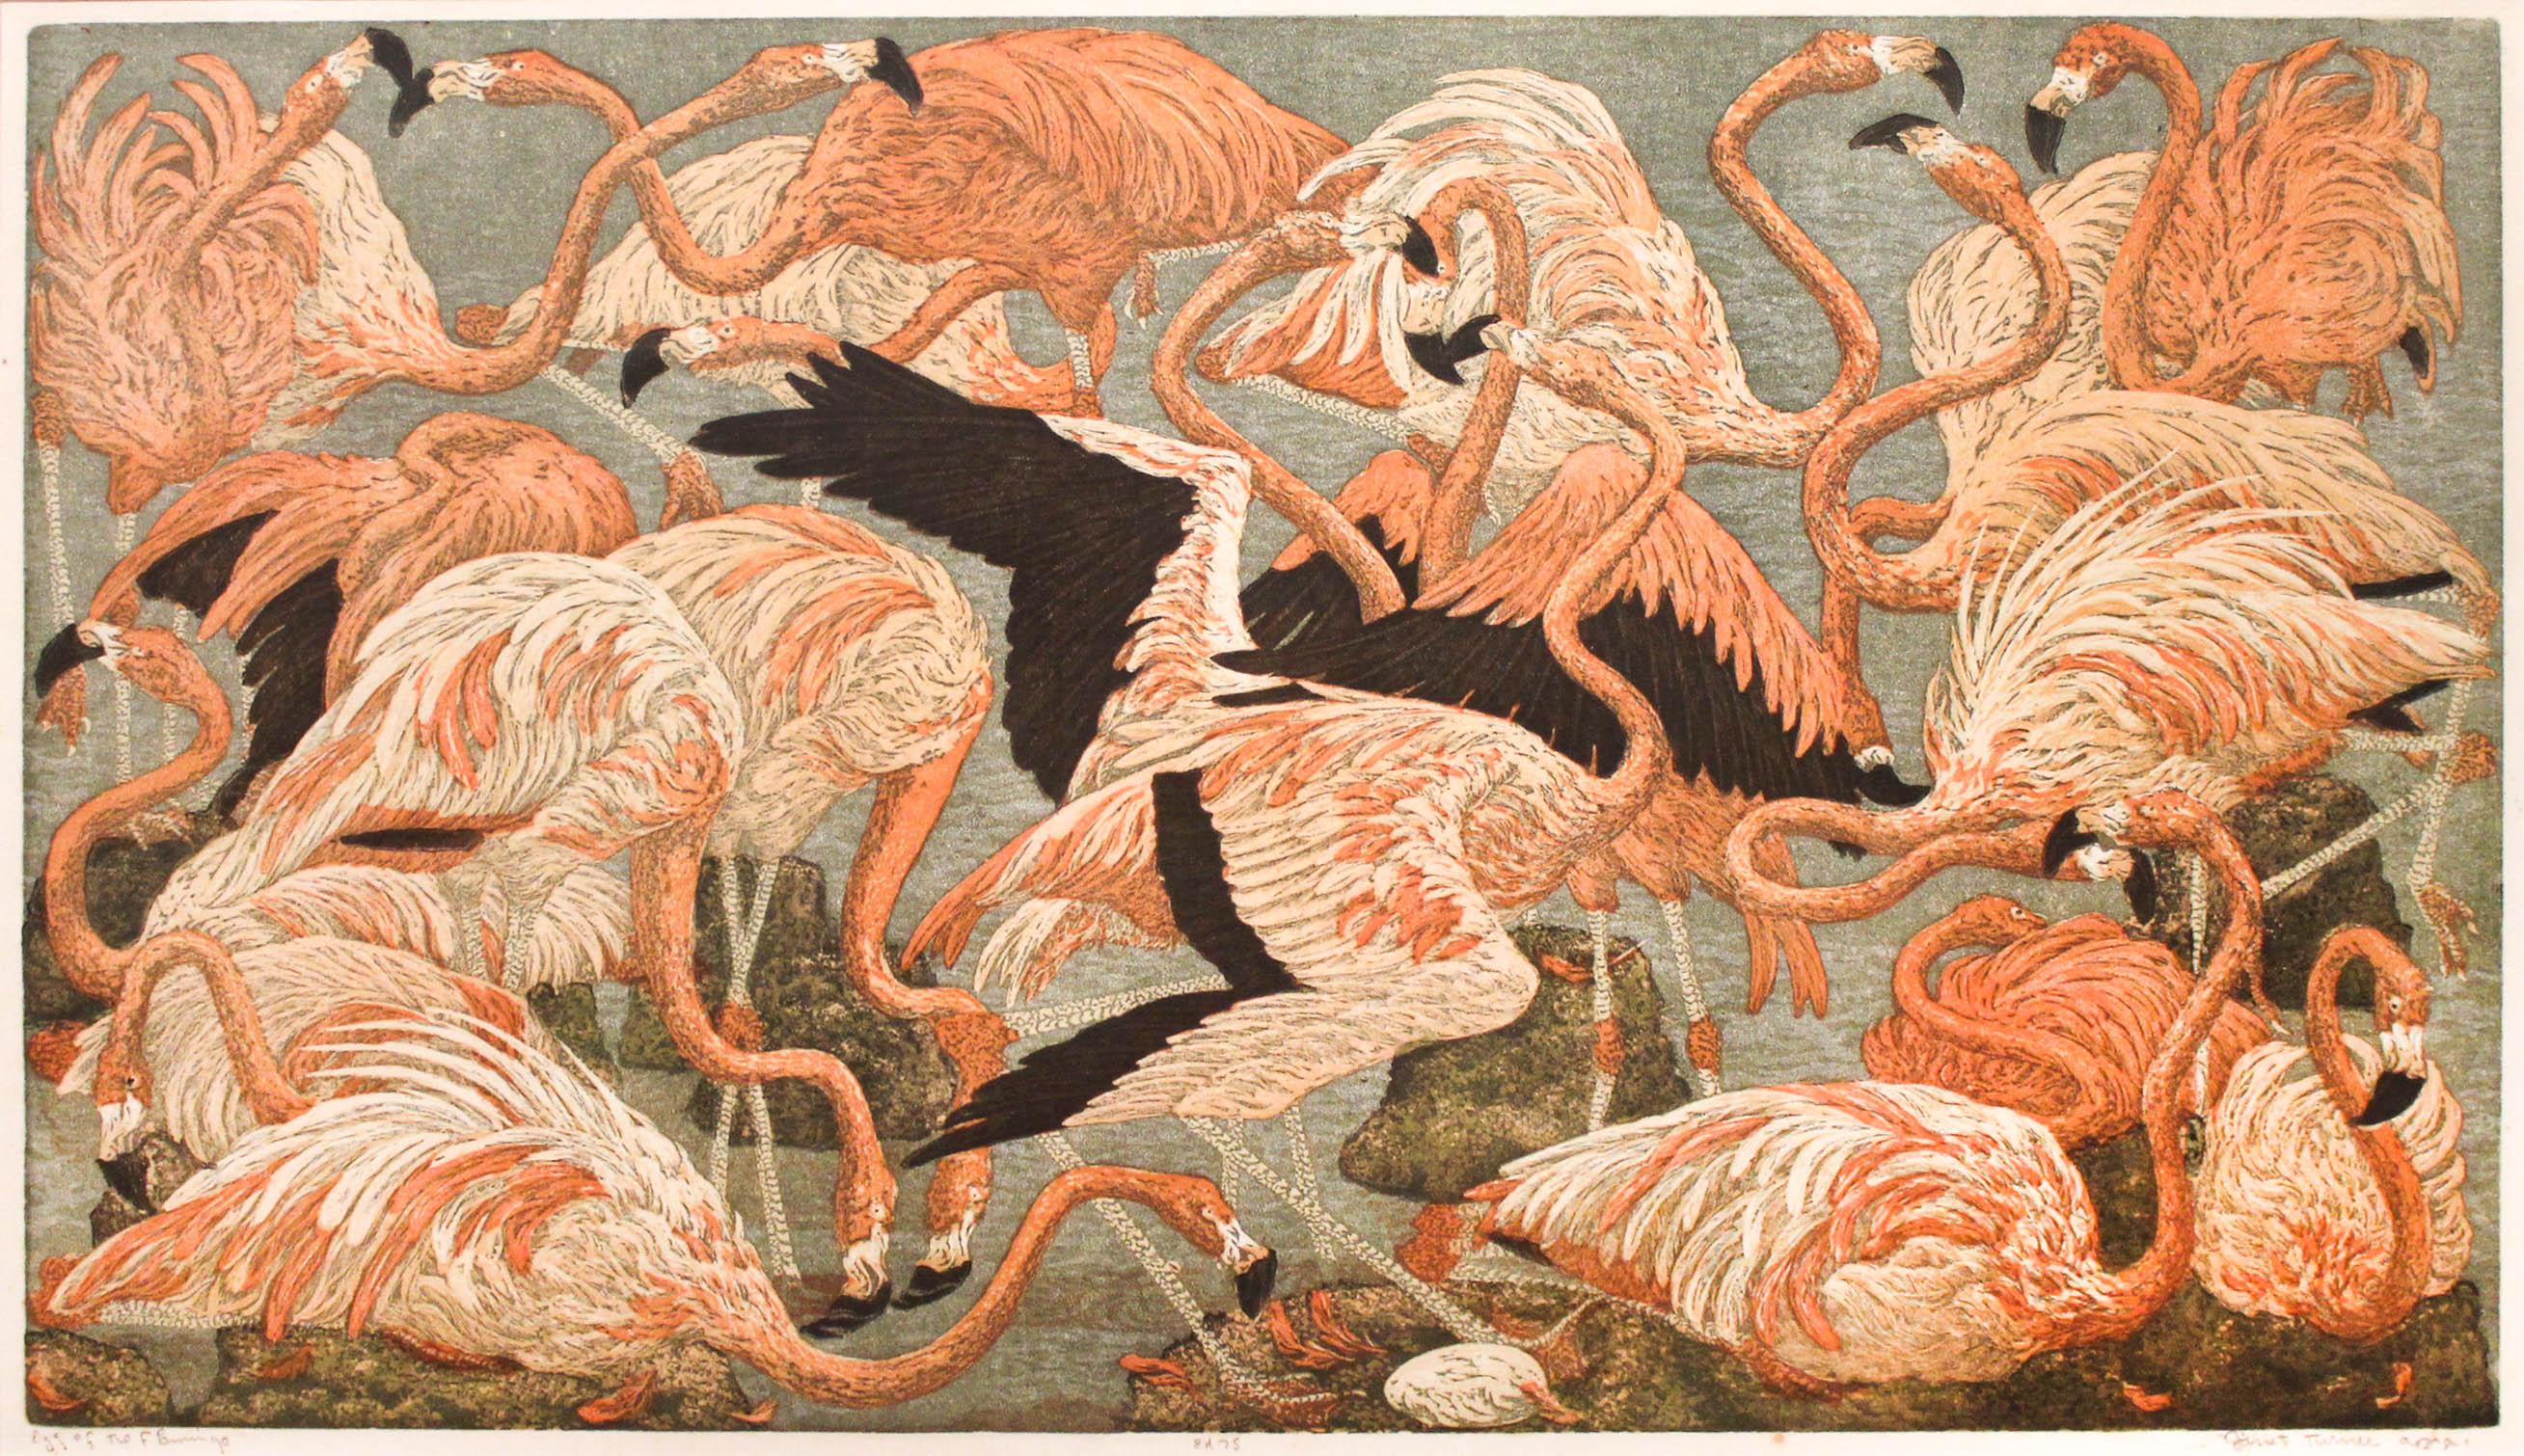 Janet Turner, Egg of the Flamingo, 1953, color linocut